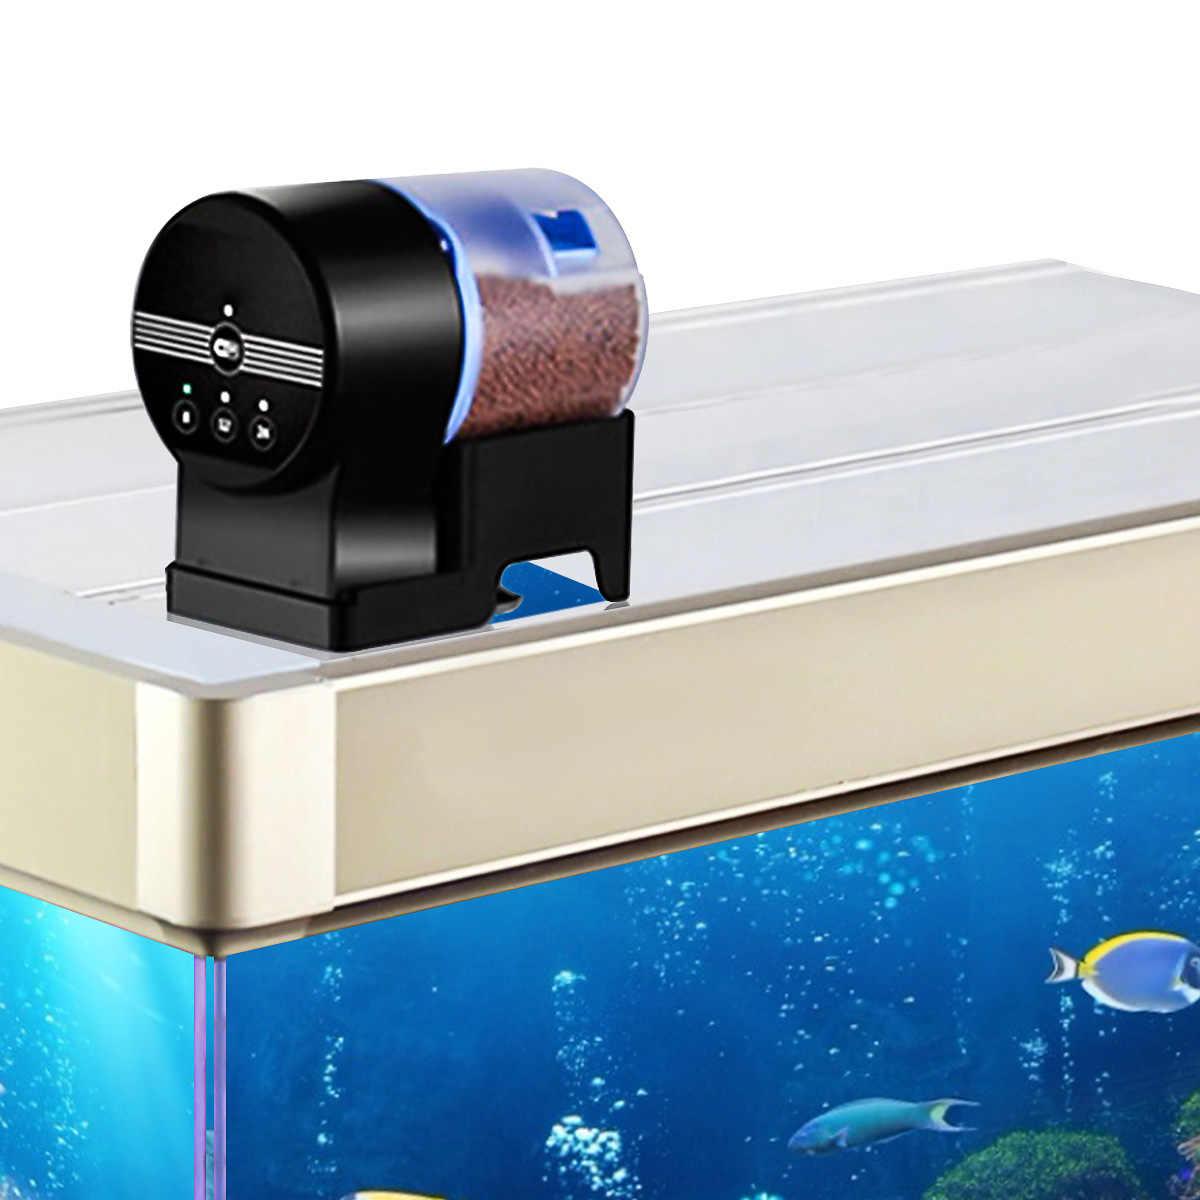 AK-01S-02-03-WIFI-Automatic-Electrical-Plastic-Fish-Tank-Timer-Feeder-Home-Aquarium-Tank-Food.jpeg_q50